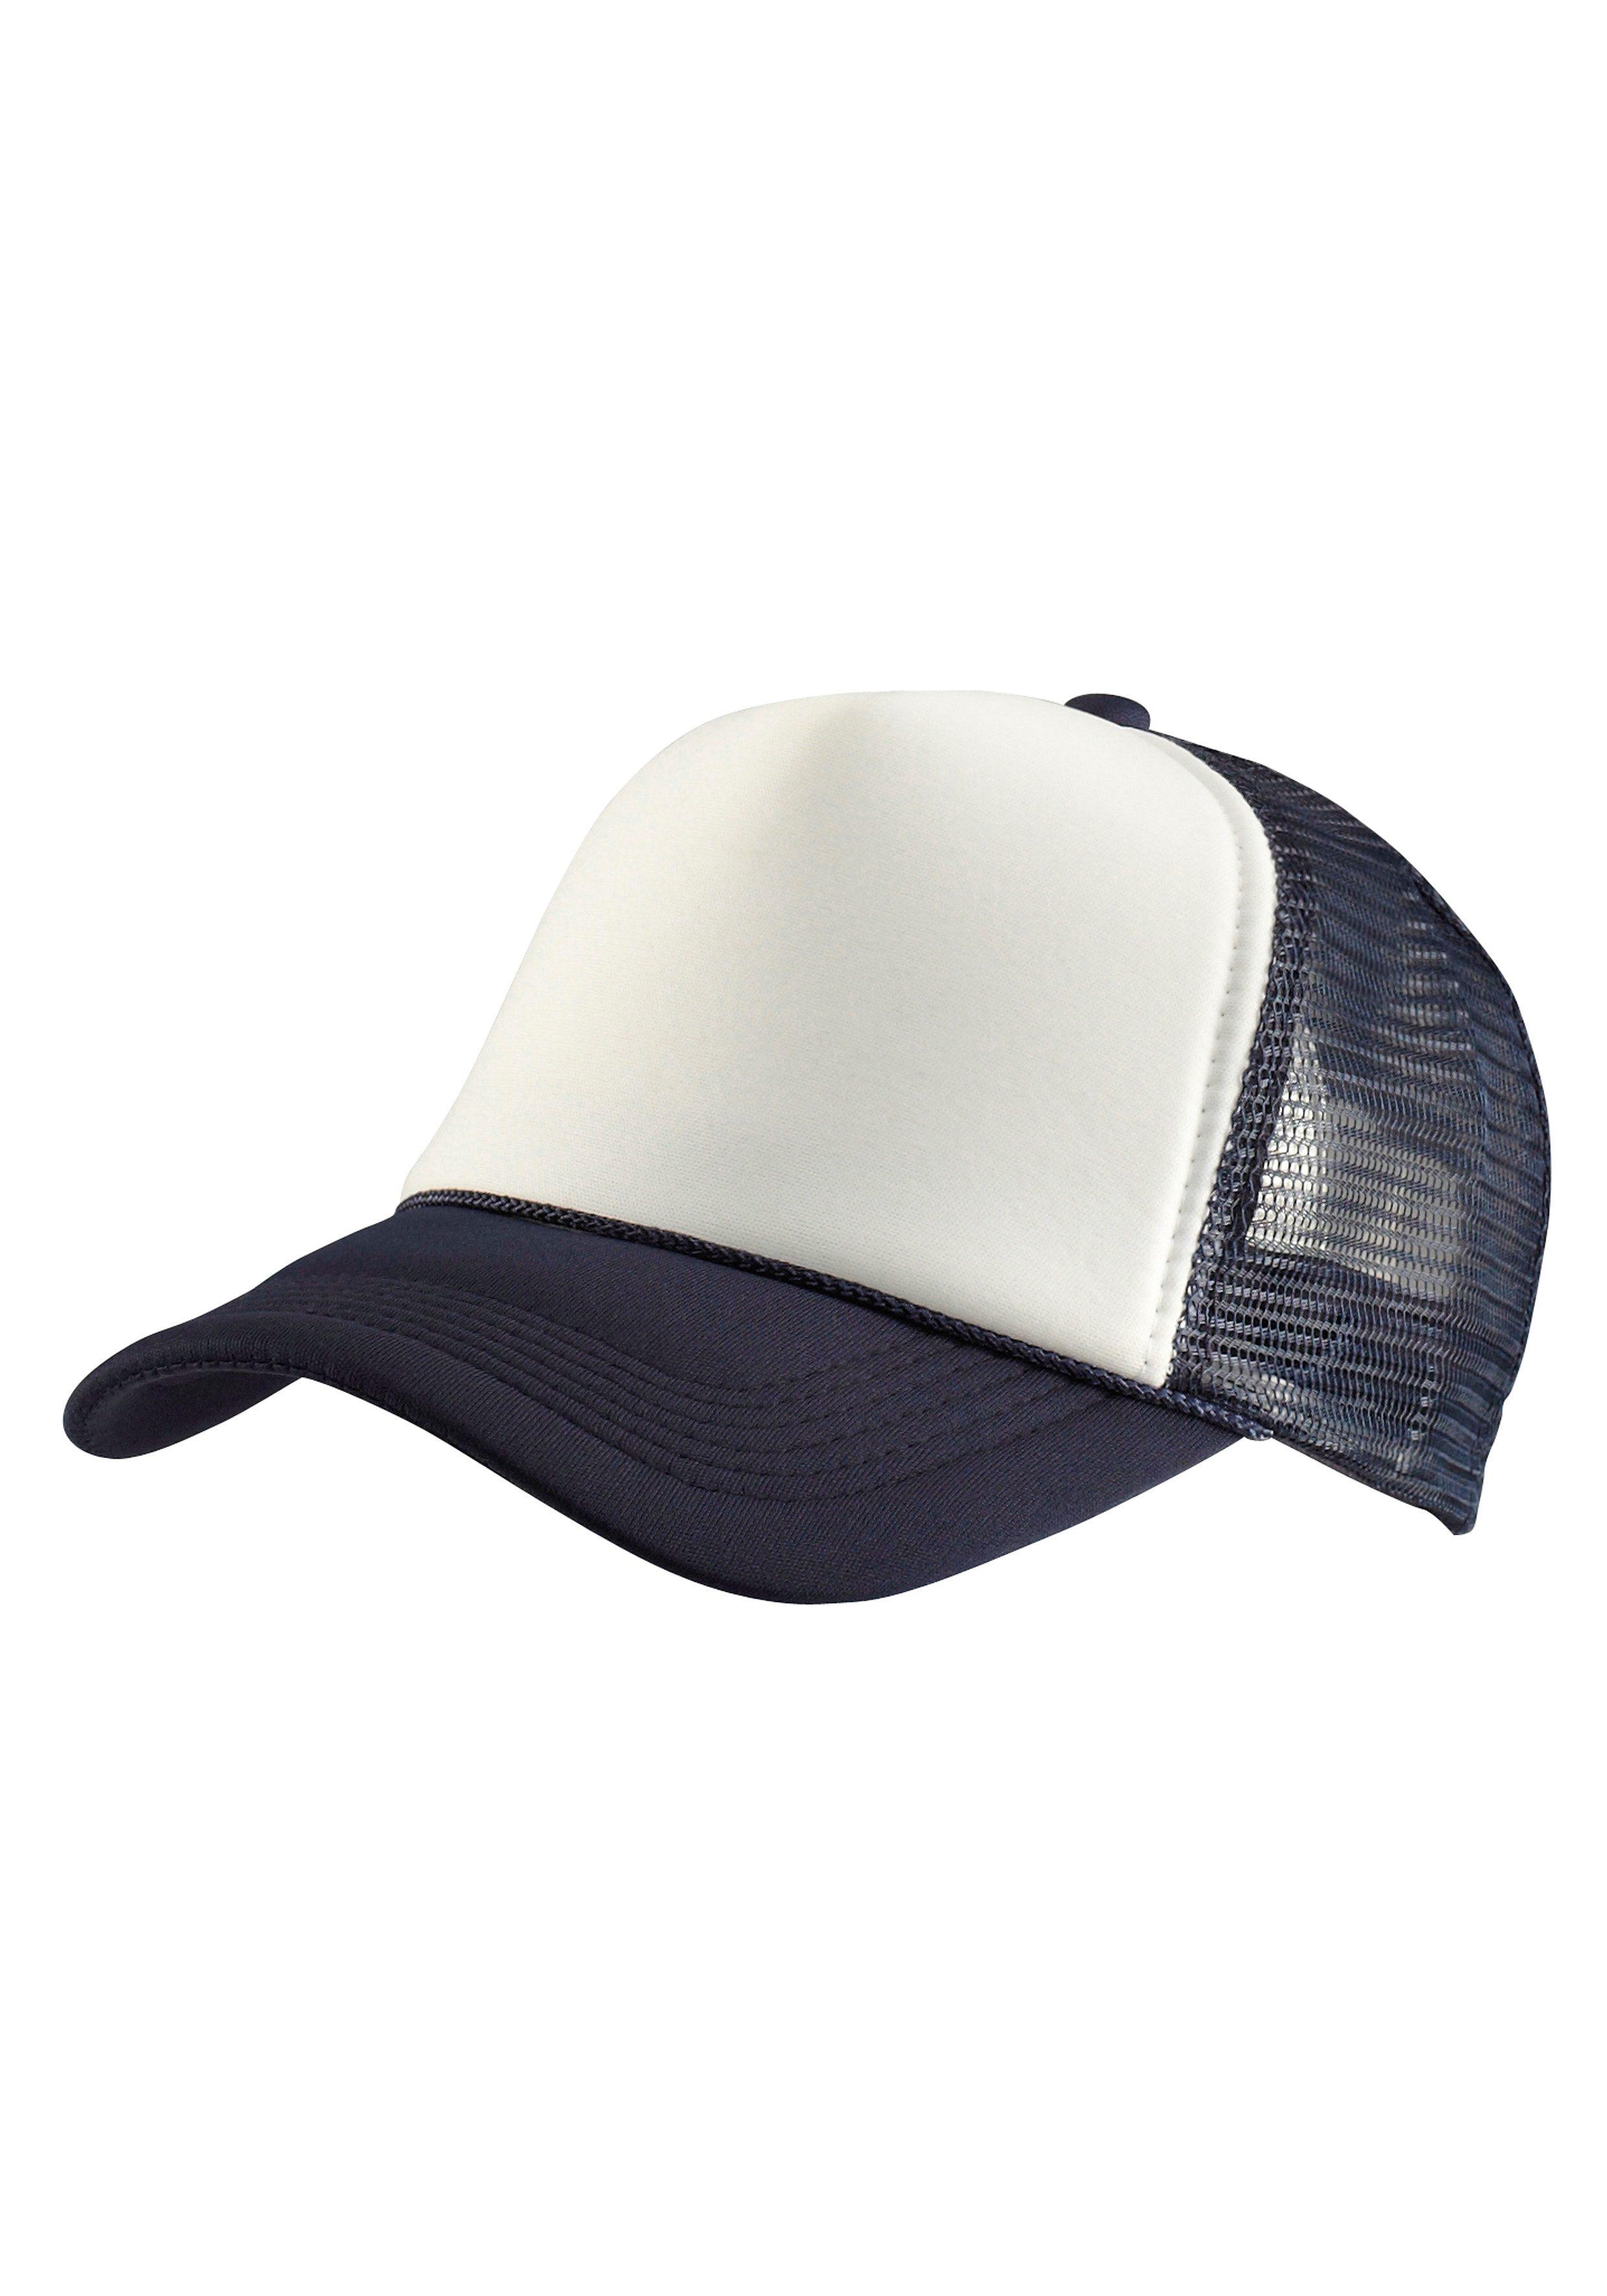 MasterDis Baseball Cap, im zeitlosen Design